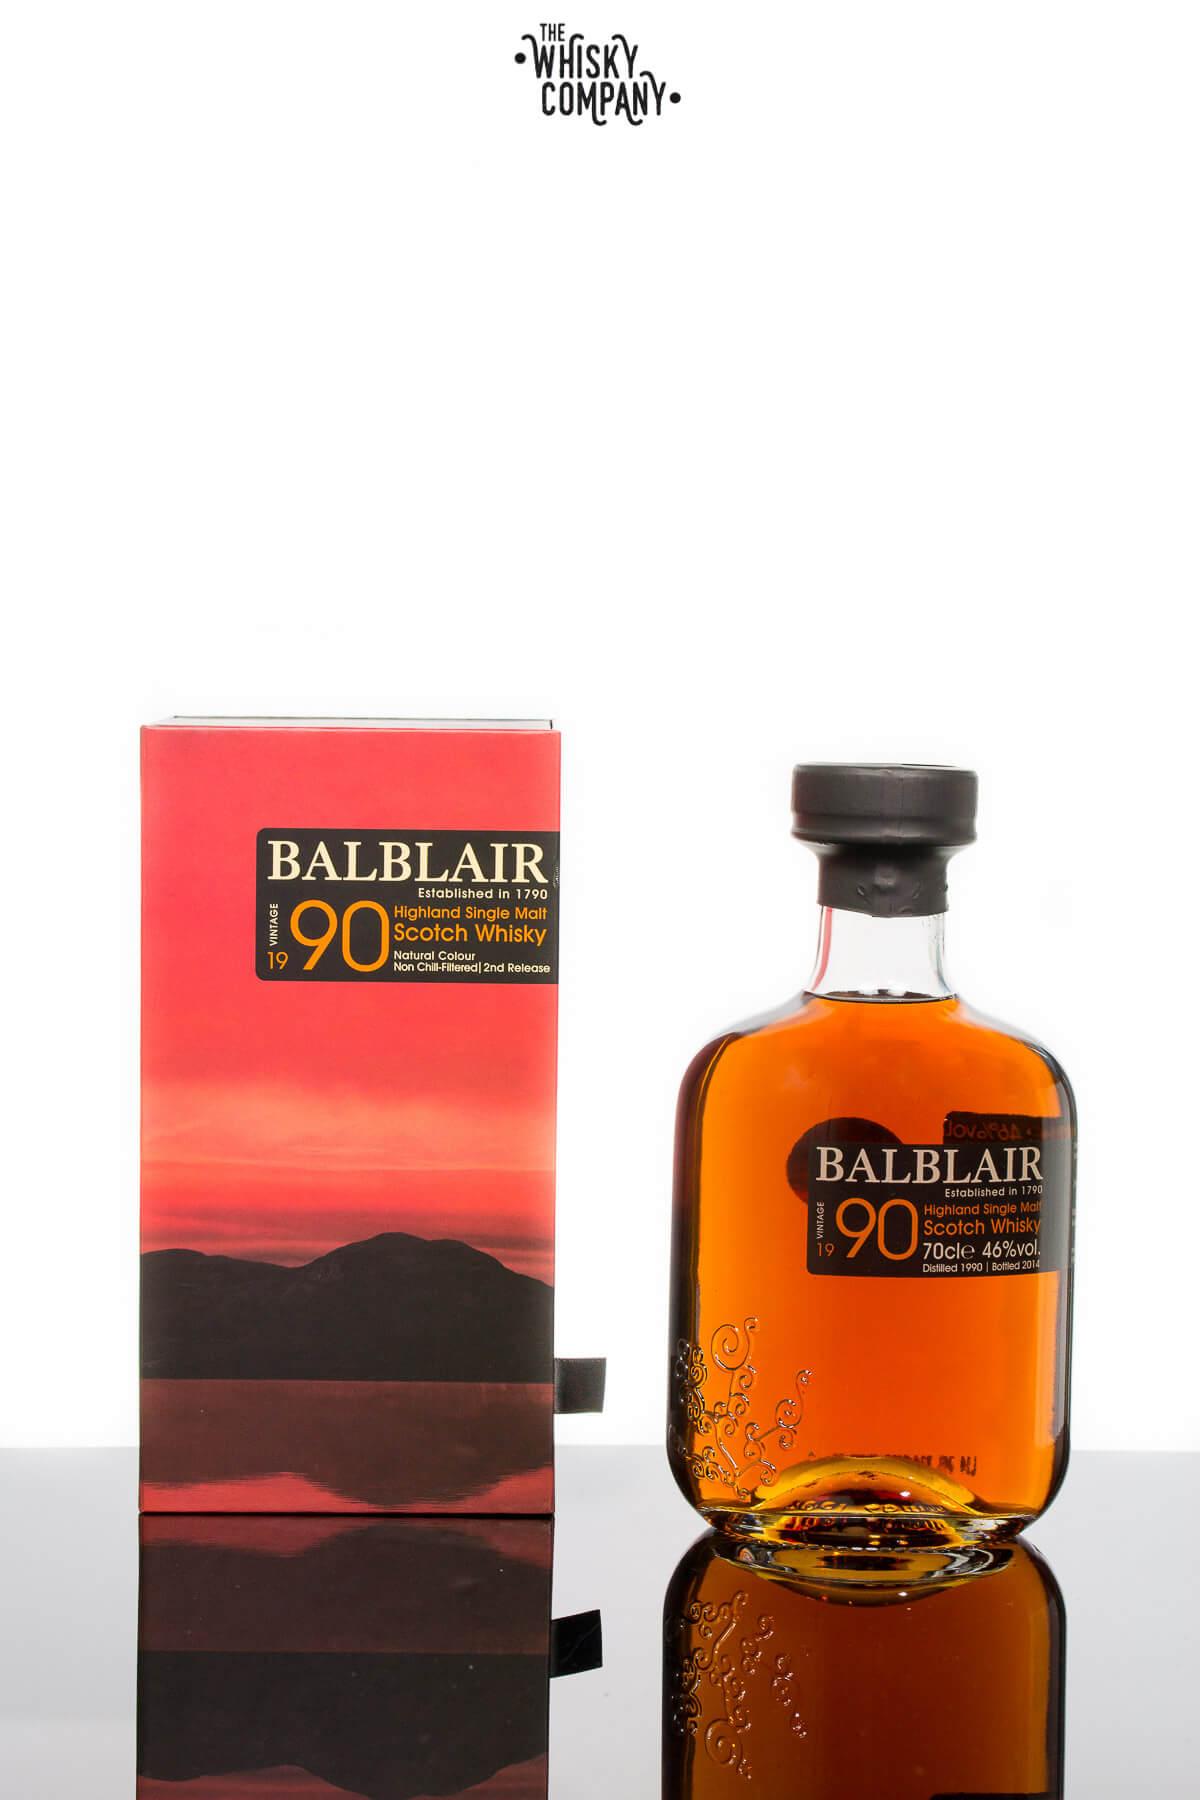 Balblair 1990 Vintage Highland Single Malt Scotch Whisky (700ml)